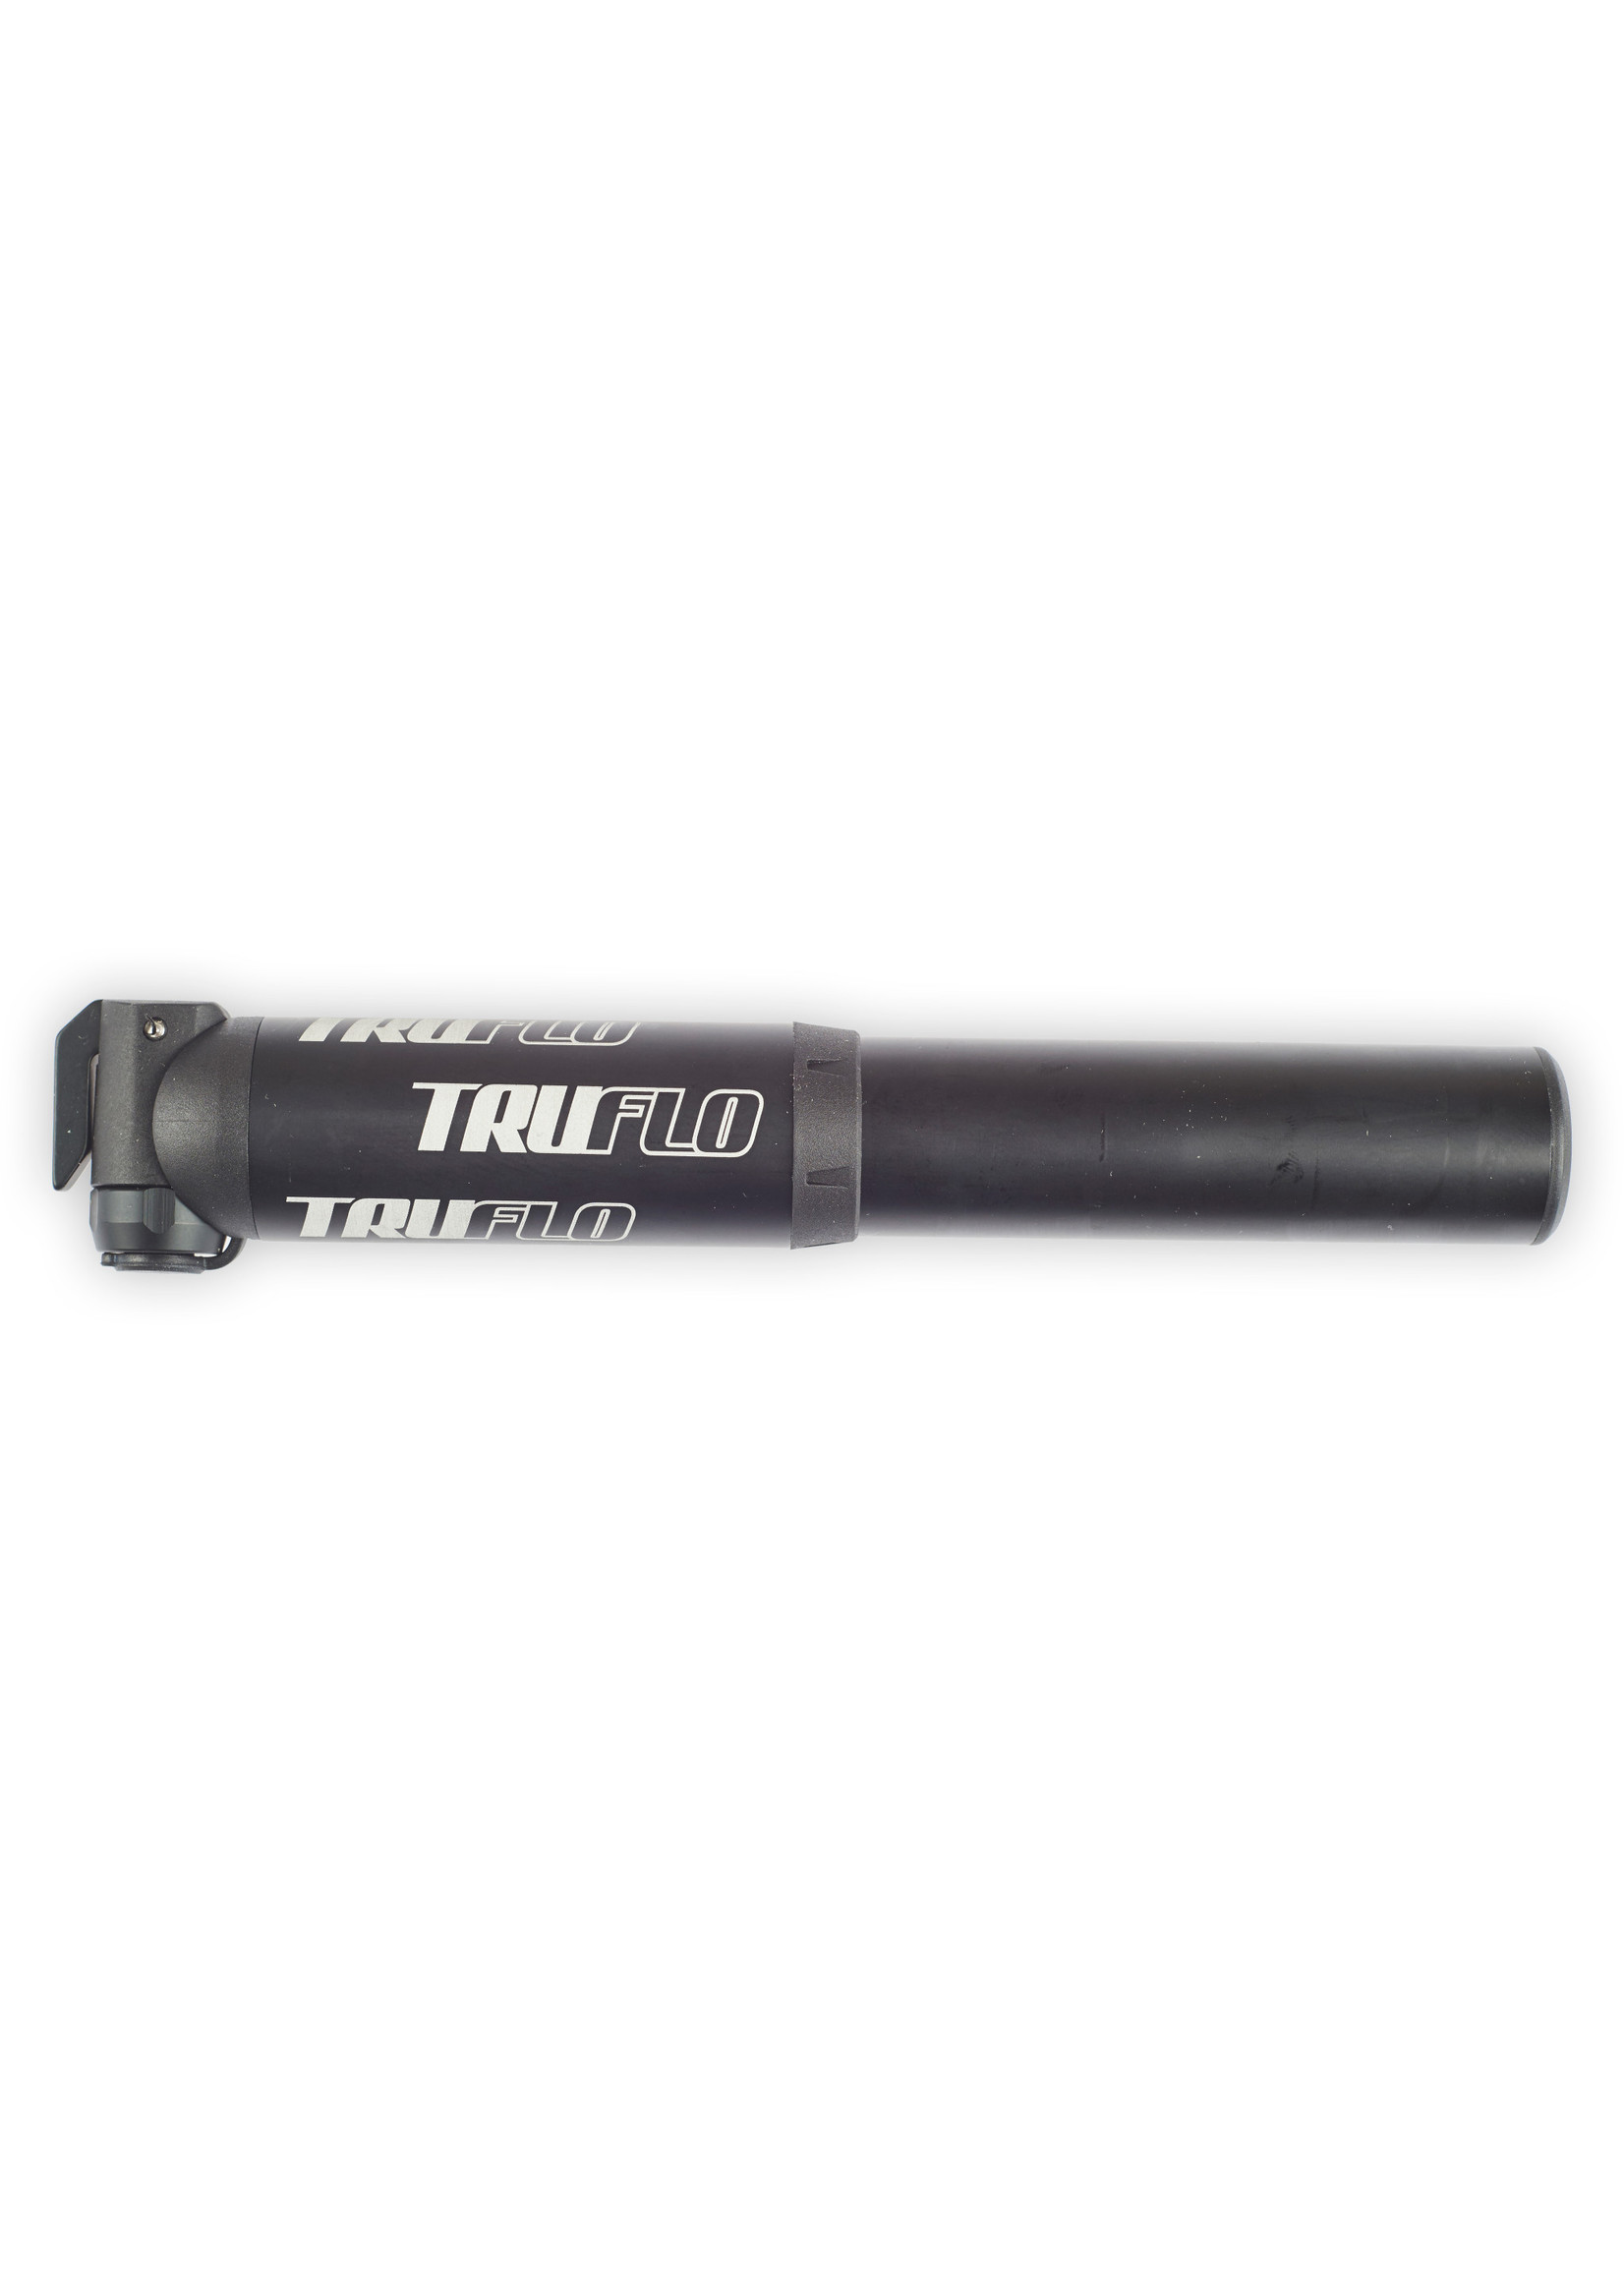 Truflo MiniMTN CNC Pump, double shot, flexi black